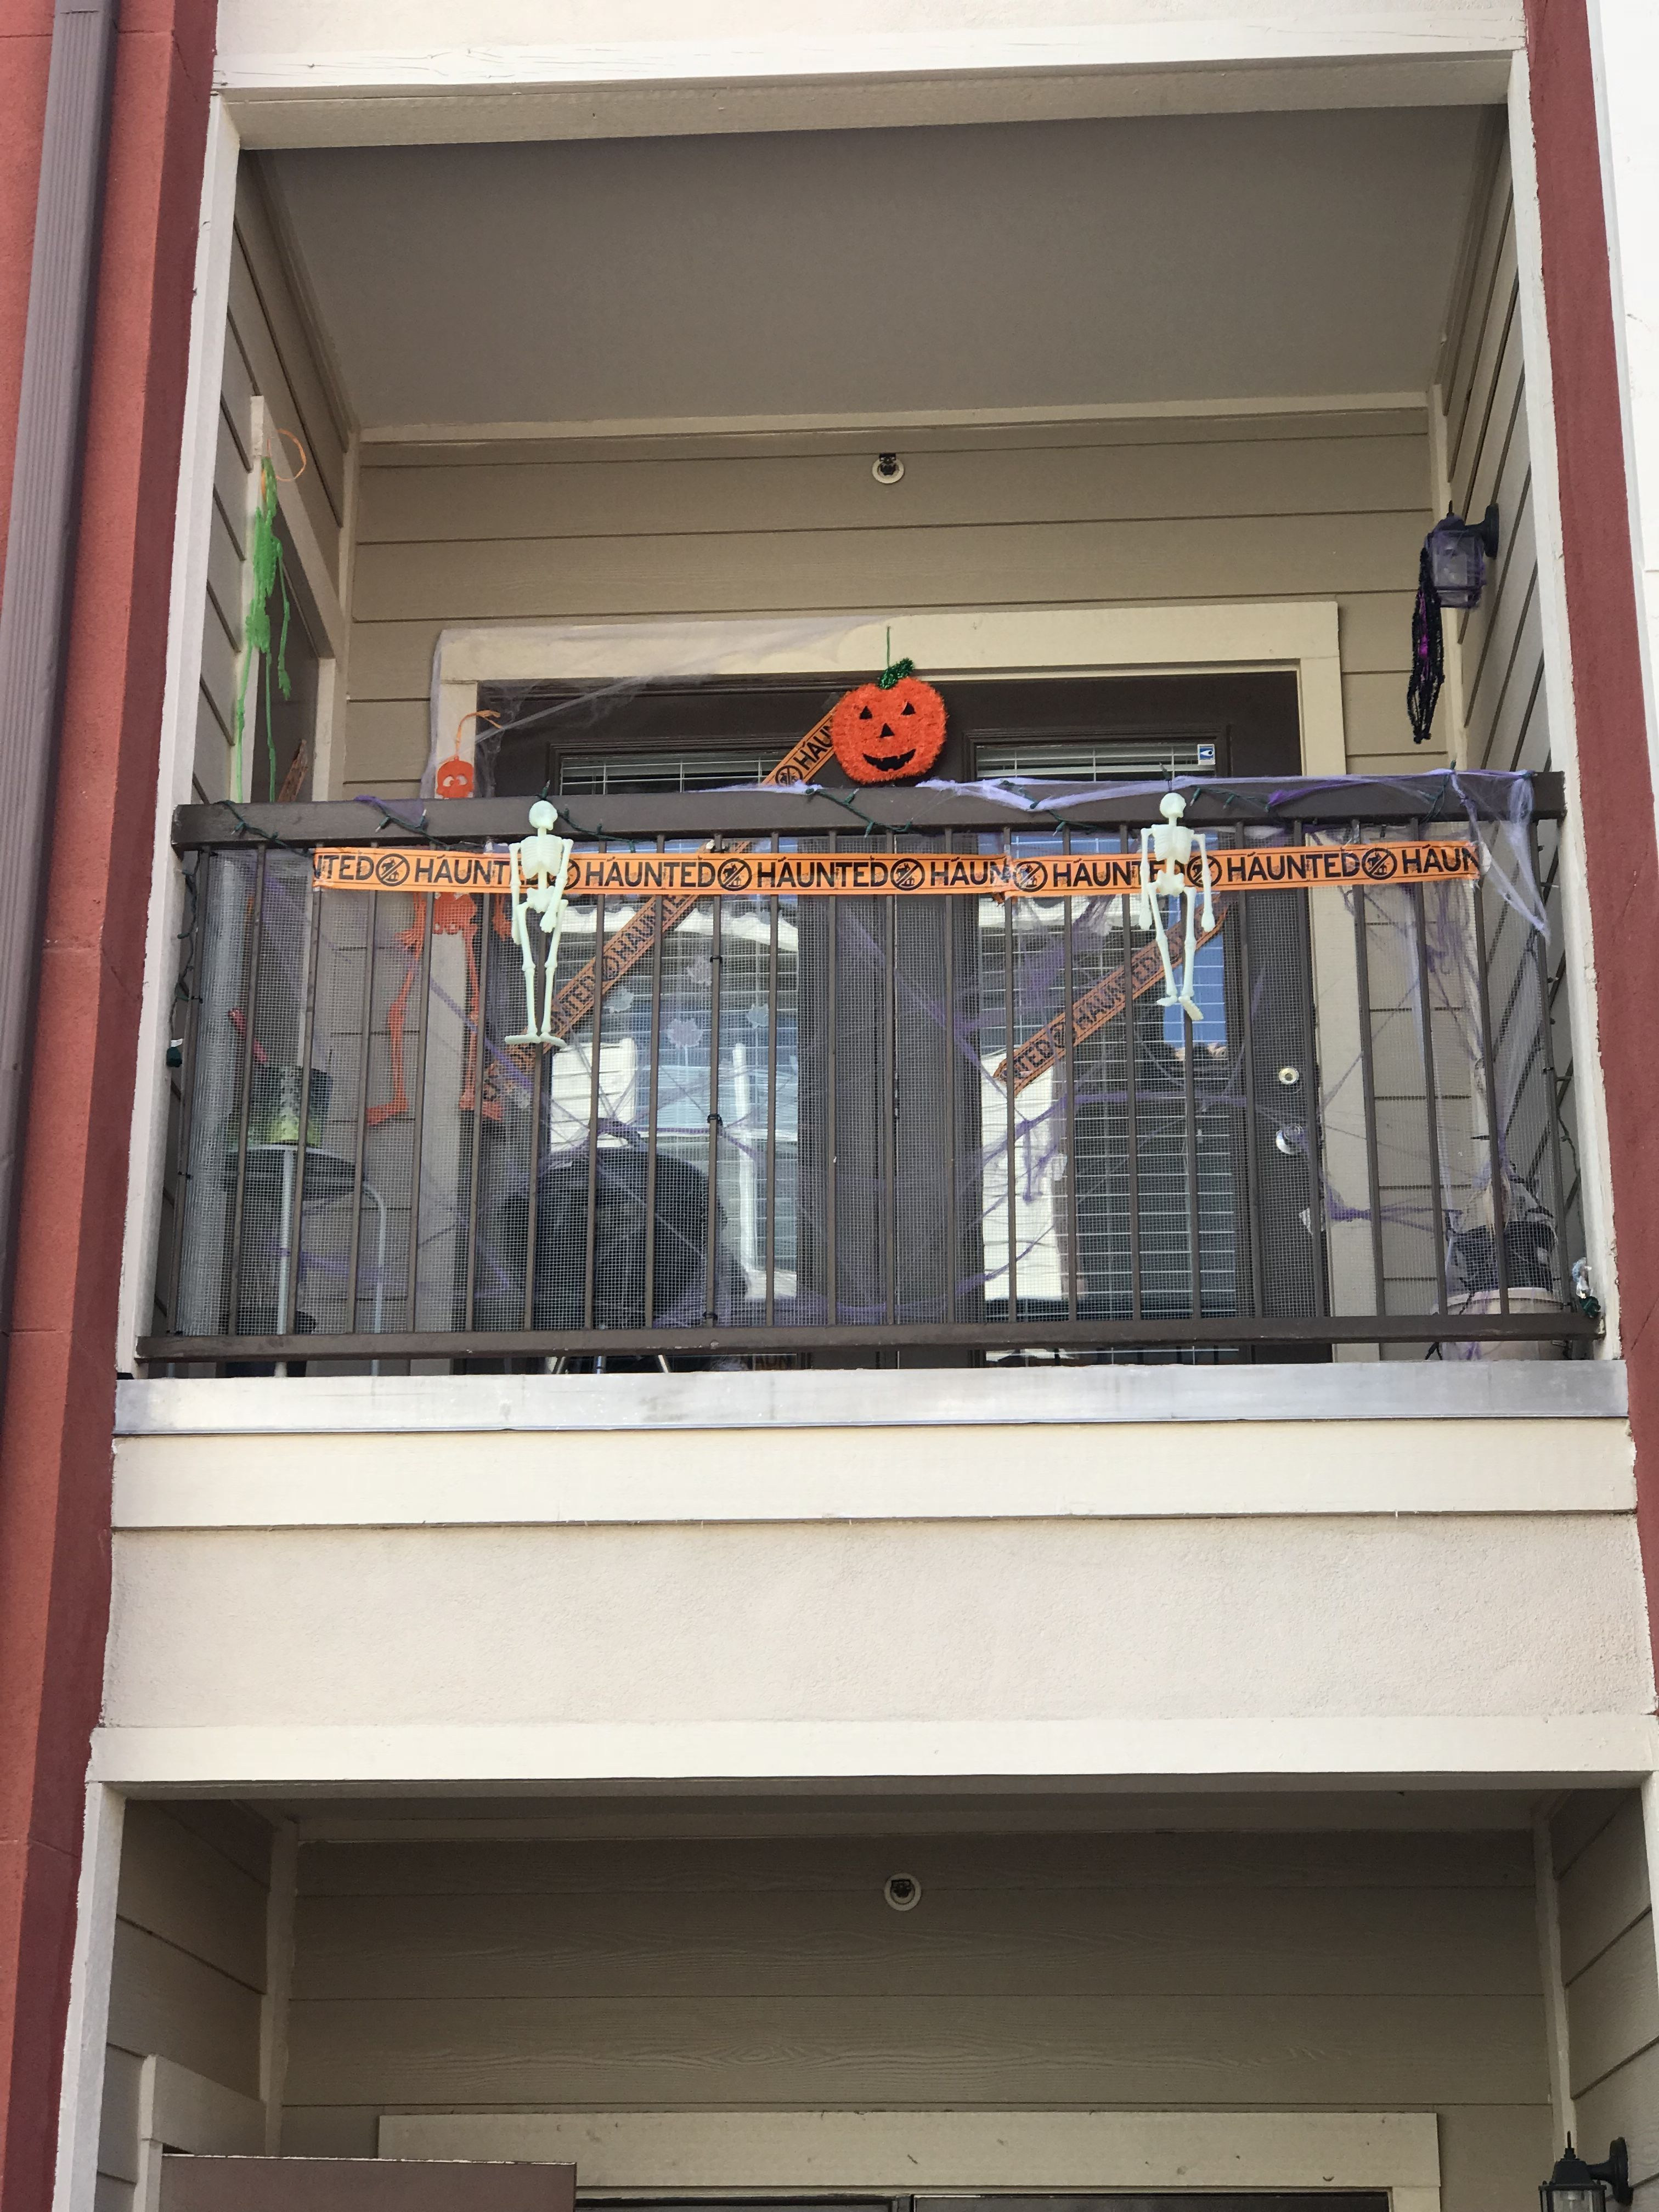 30 amazing halloween ideas for apartment balcony halloween rh pinterest com